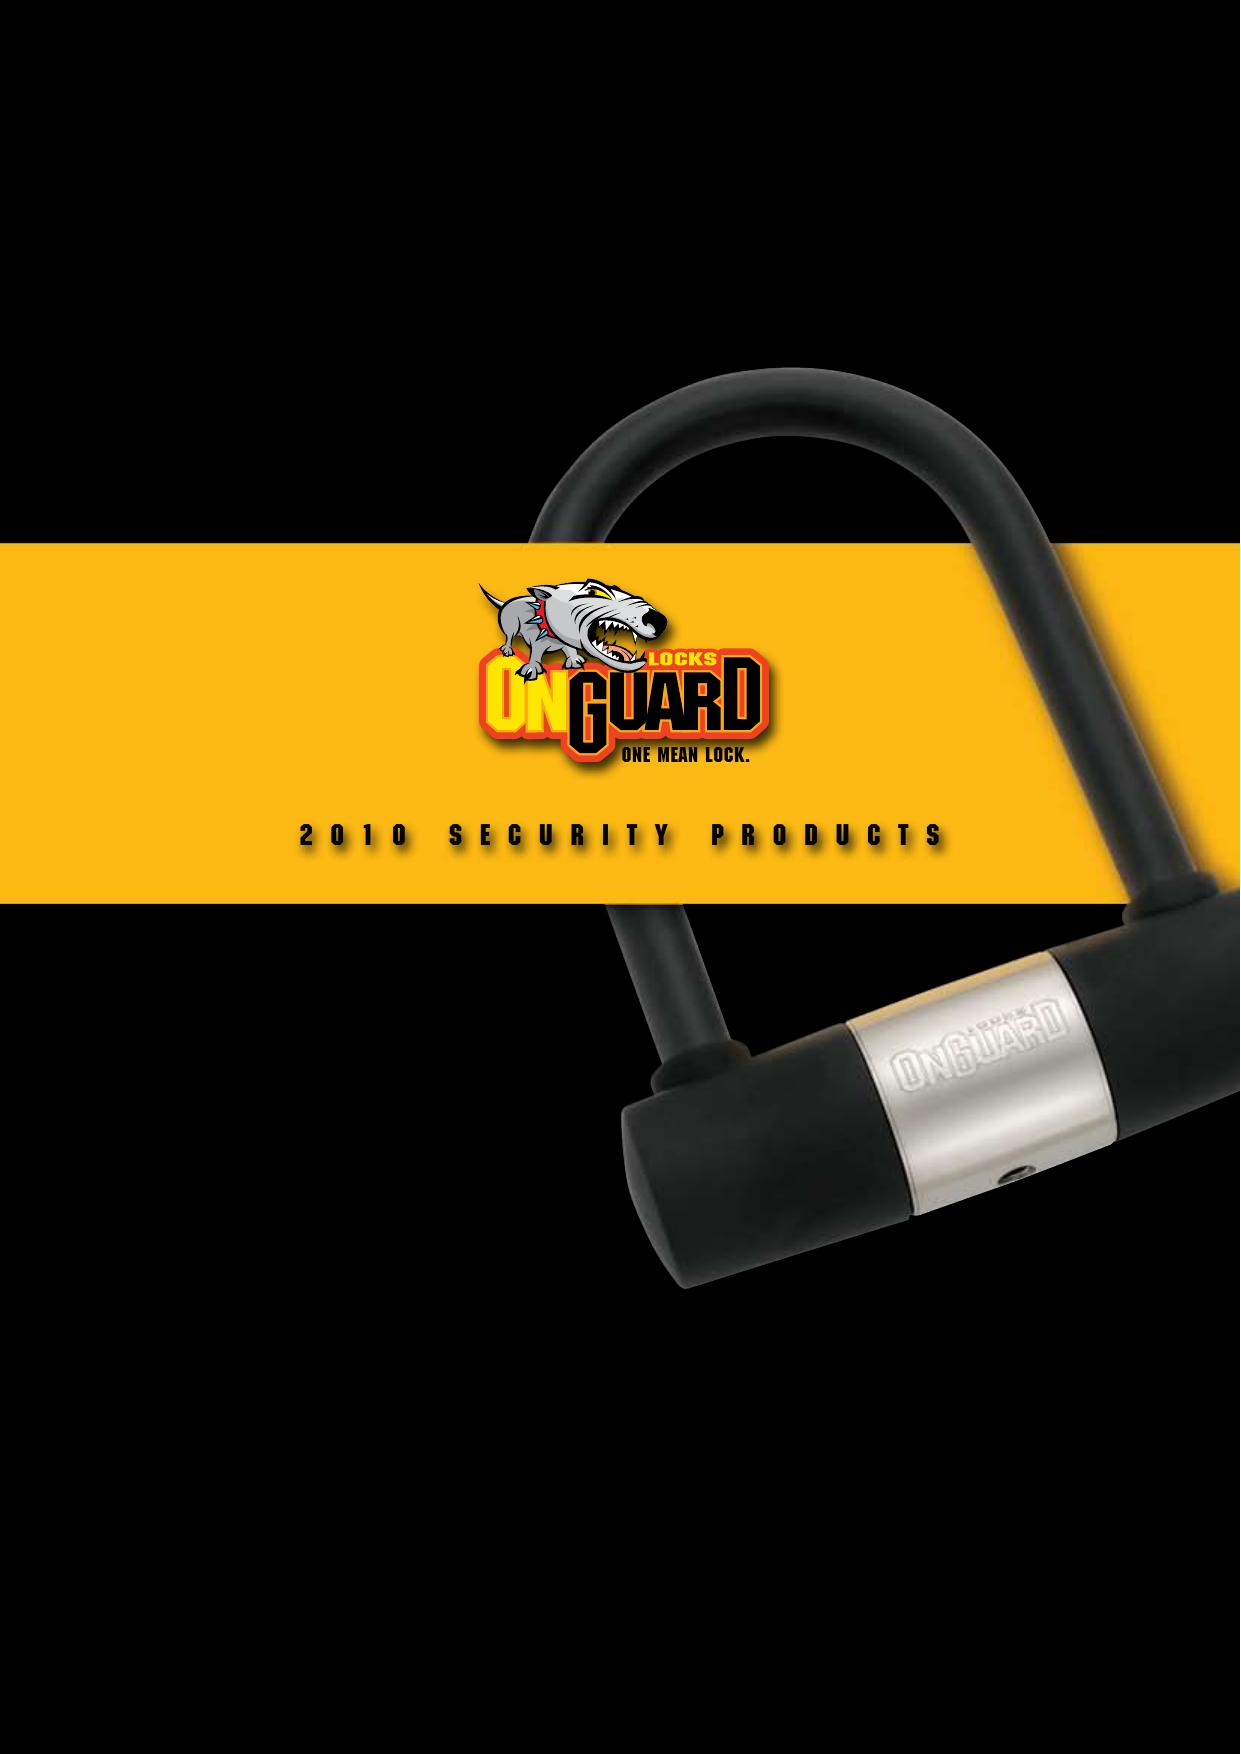 OnGuard Coil Cable 5033 Doberman Key Lock